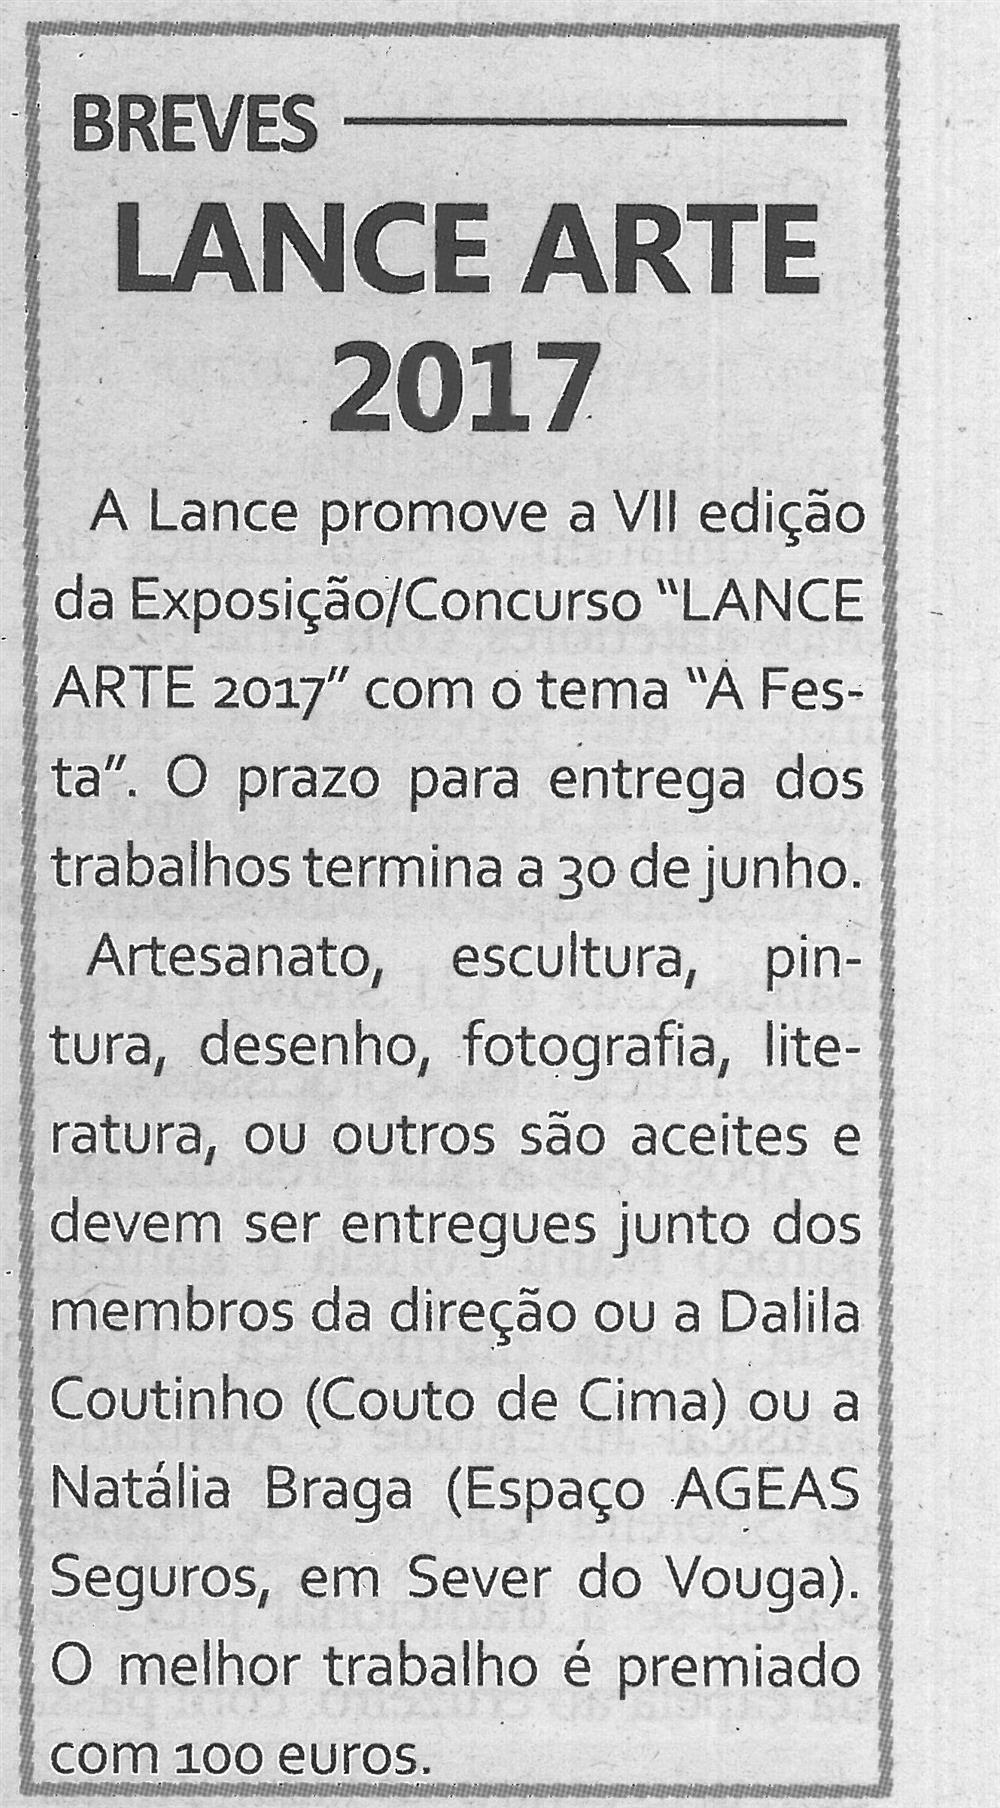 TV-jun.'17-p.7-LANCE Arte 2017.jpg